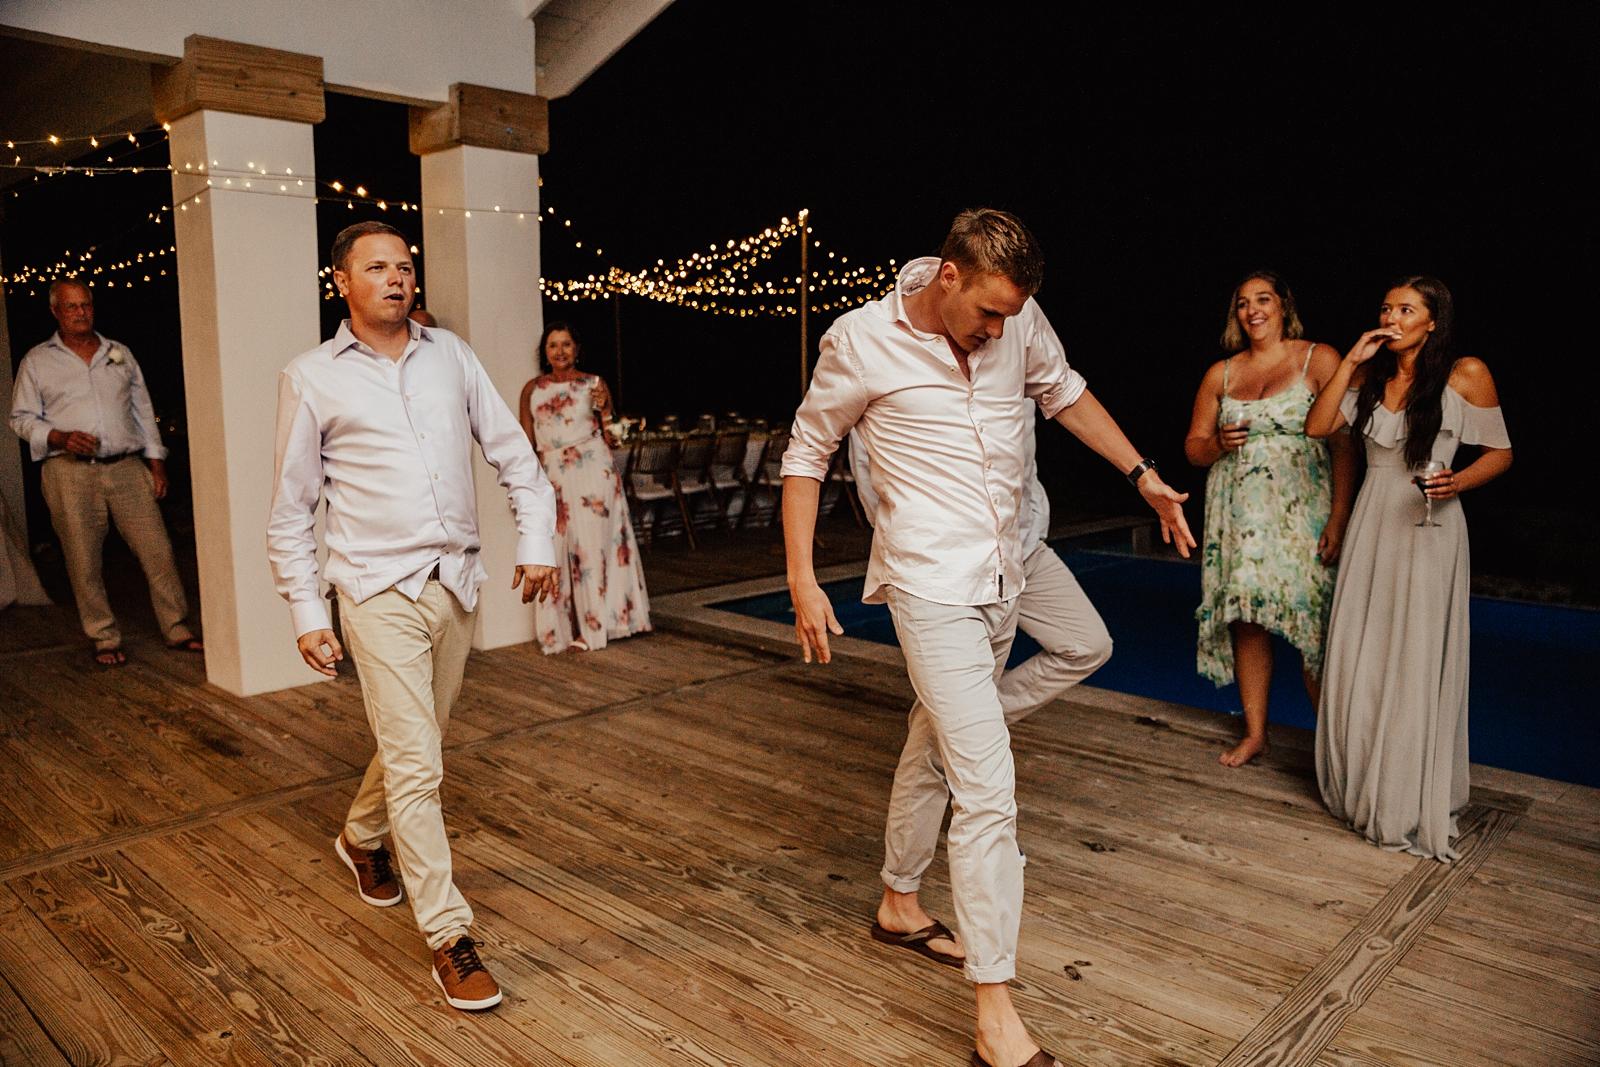 Jenni & Andrew Intimate Beach Destination Wedding in Little Exuma, Bahamas_0547.jpg